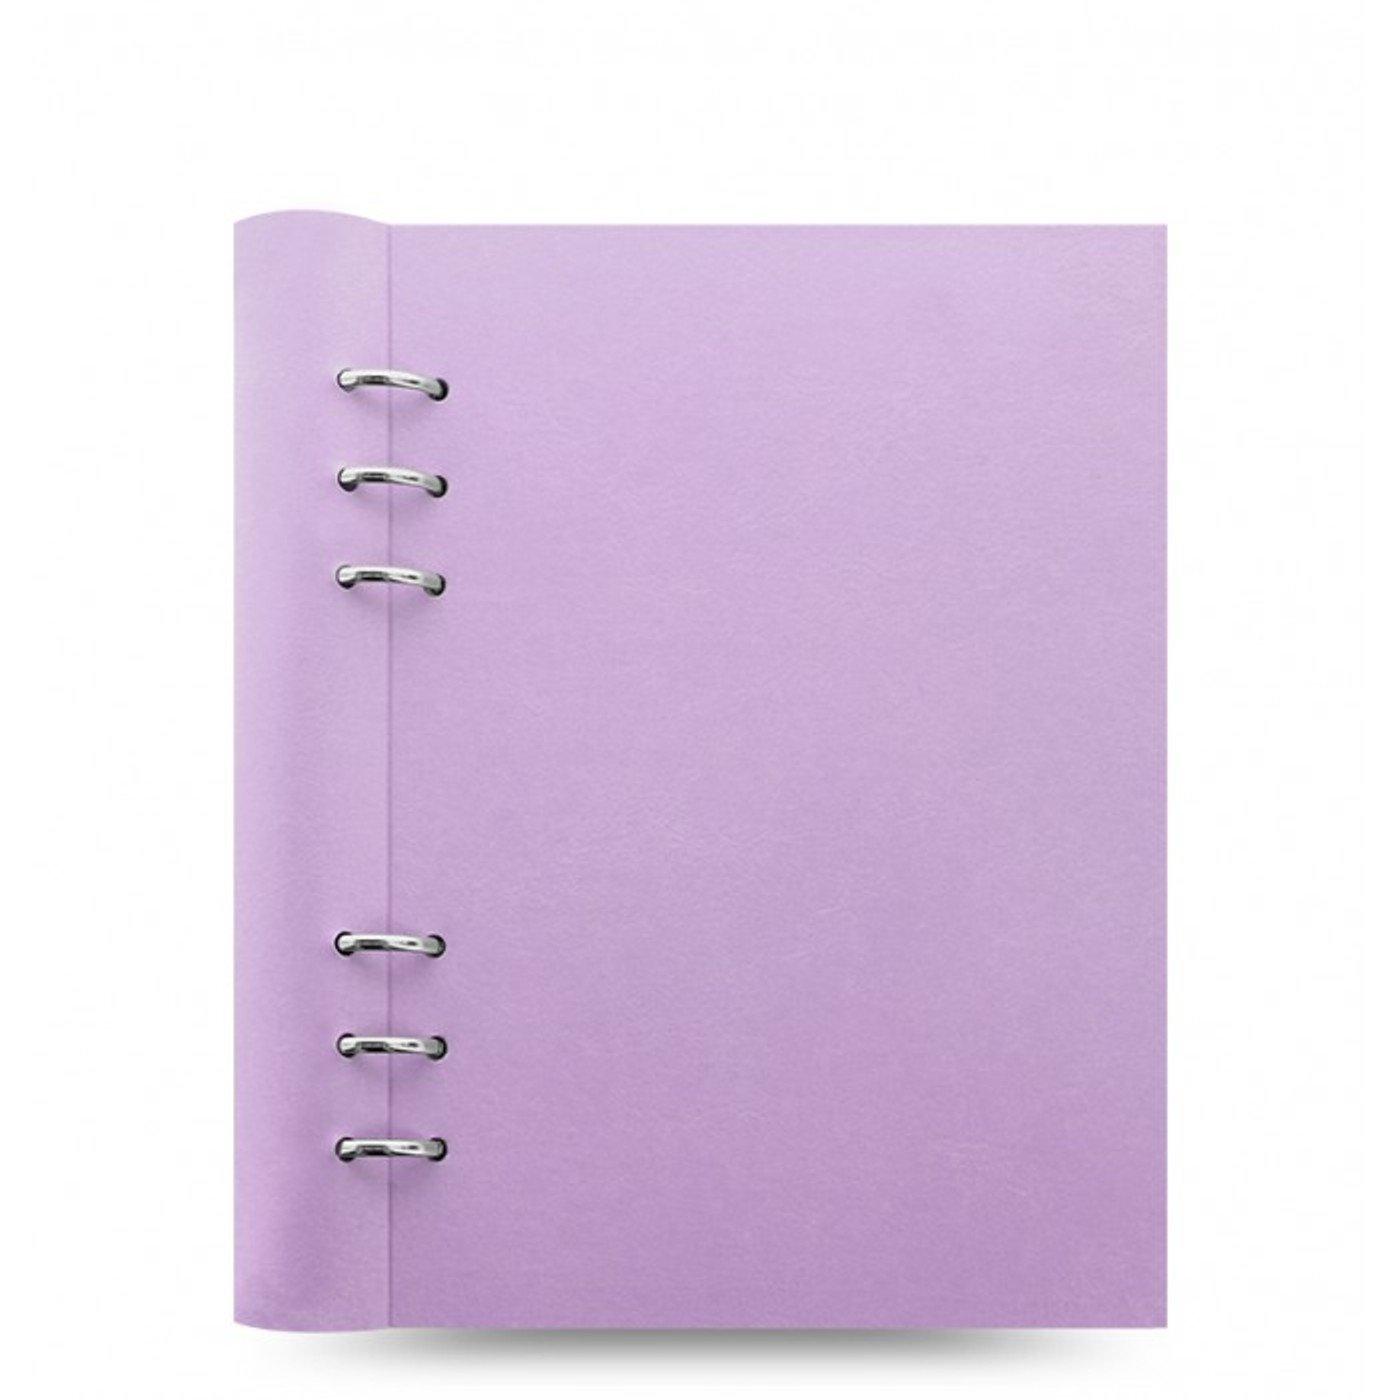 Filofax A5 Clipbook Notizbuch Orchid Violet Skizzenbuch Kladde Tagebuch 023623